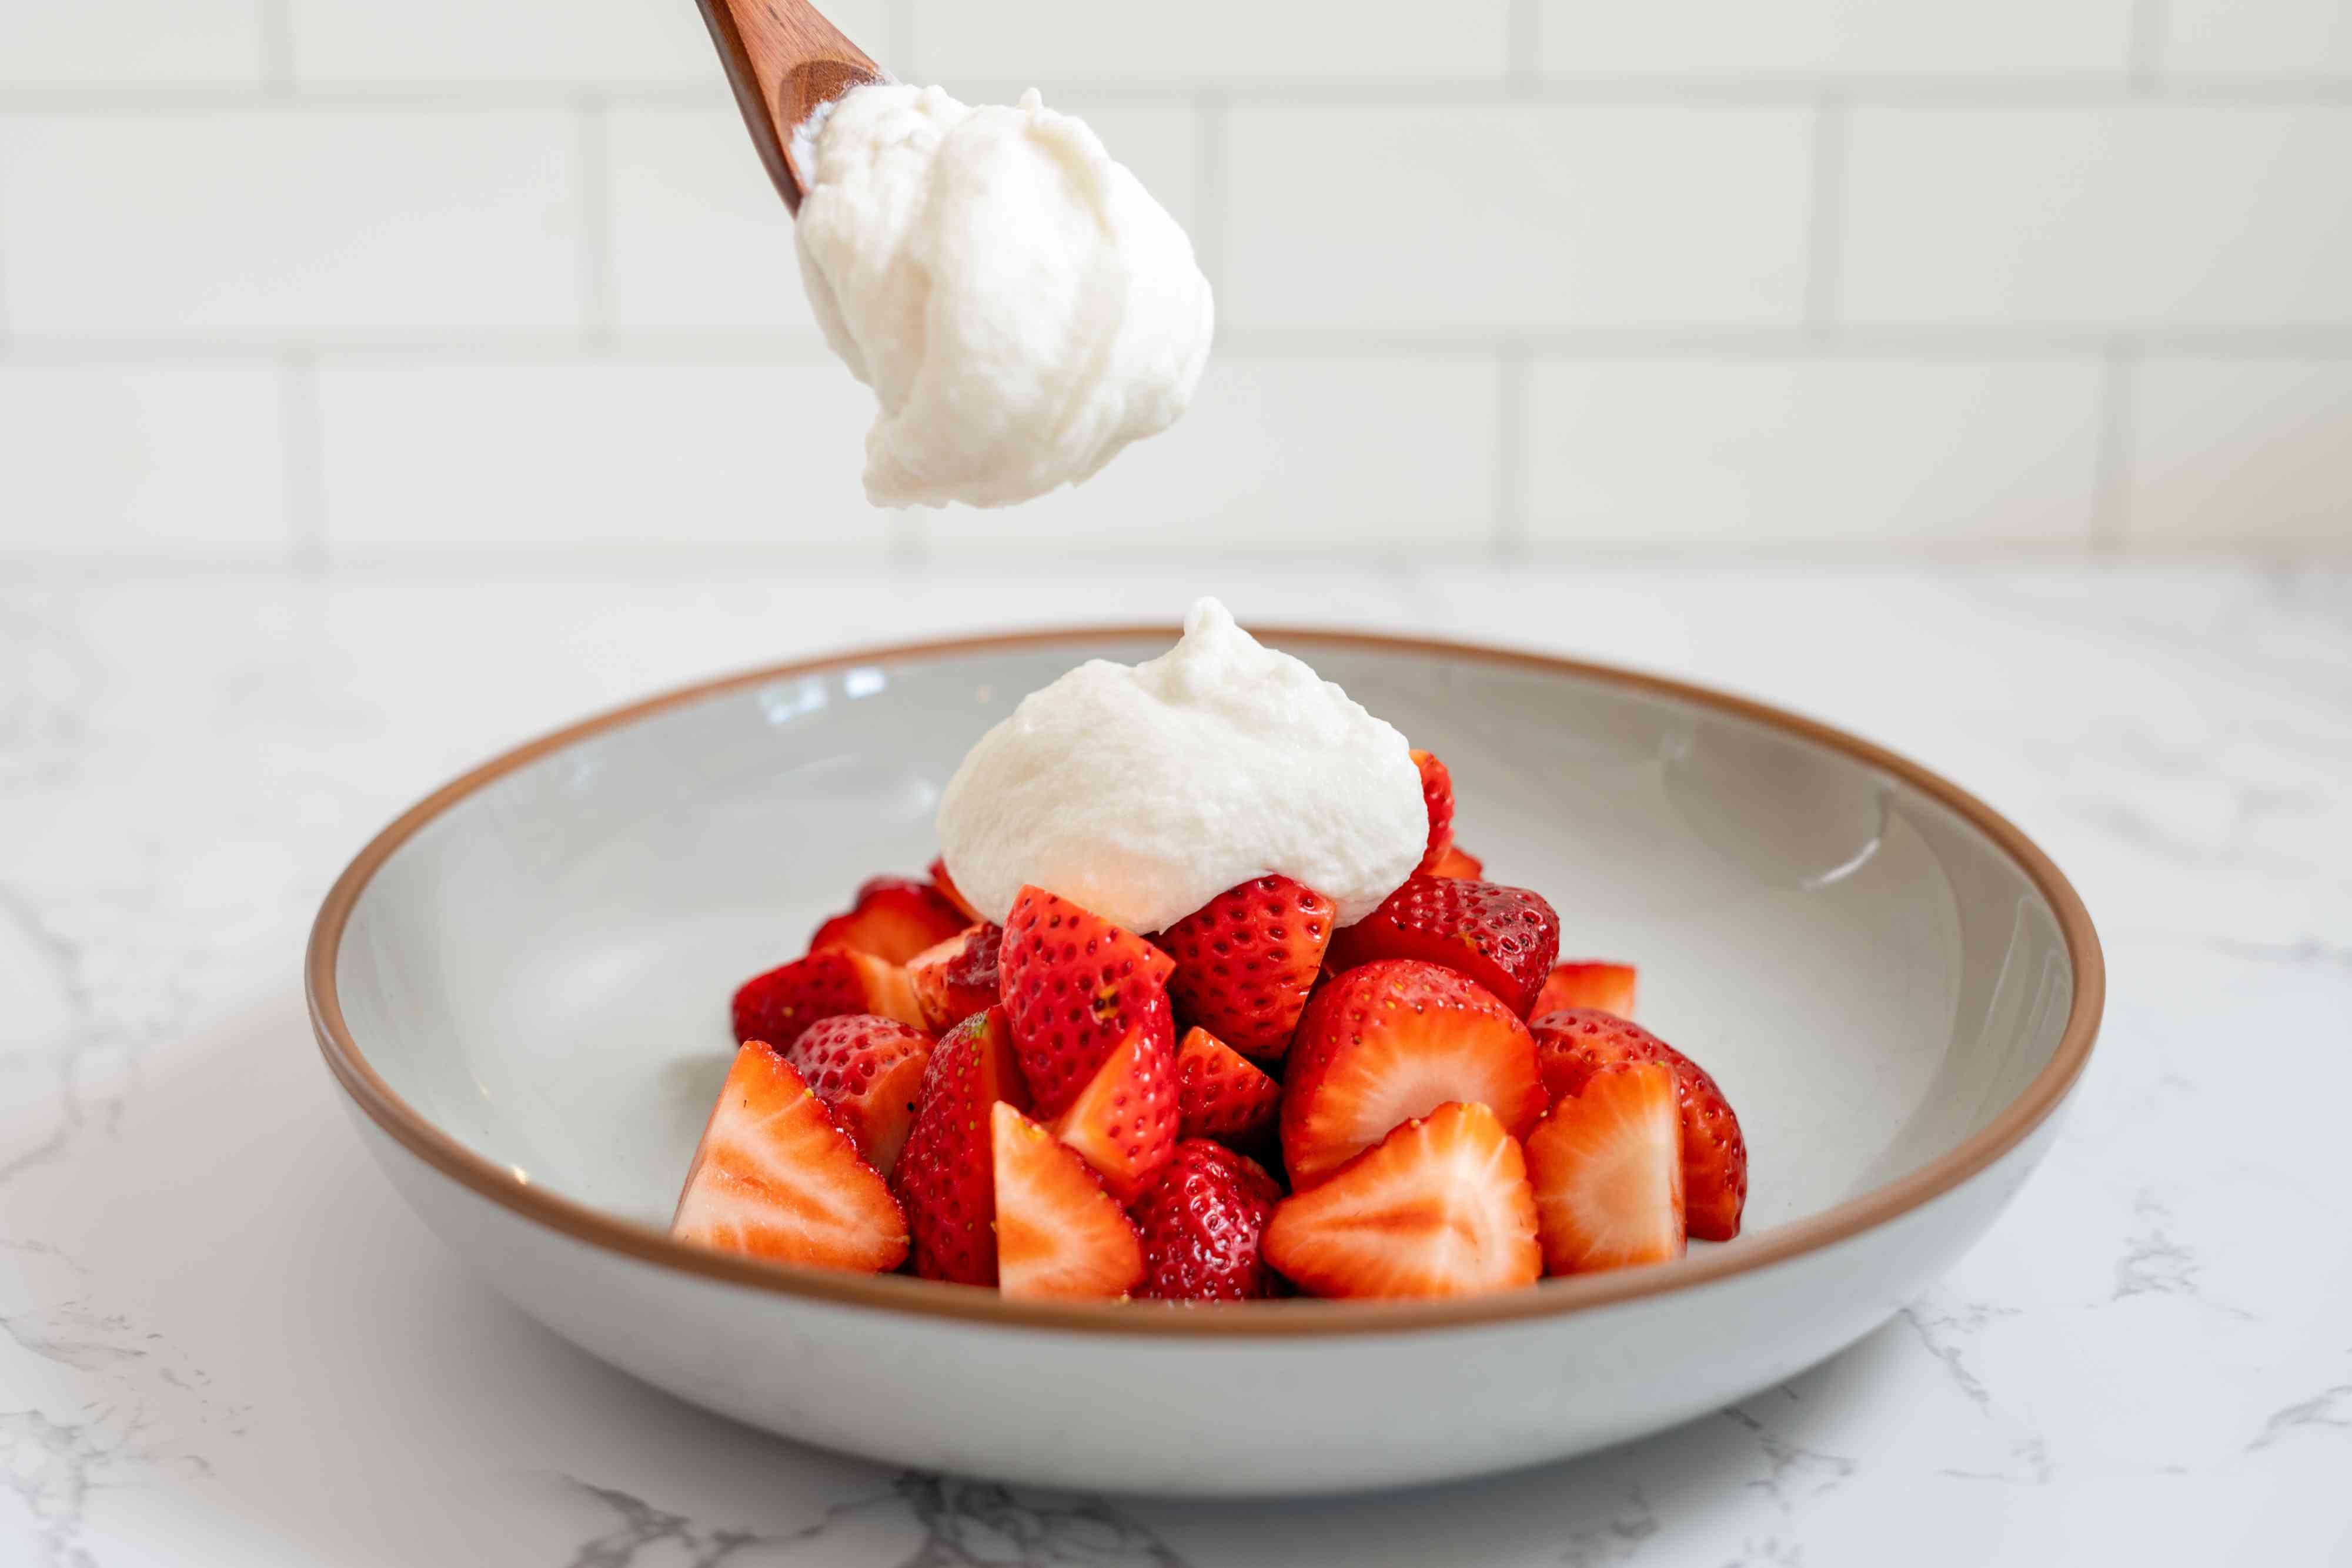 Vegan Whipped Cream on top of strawberries